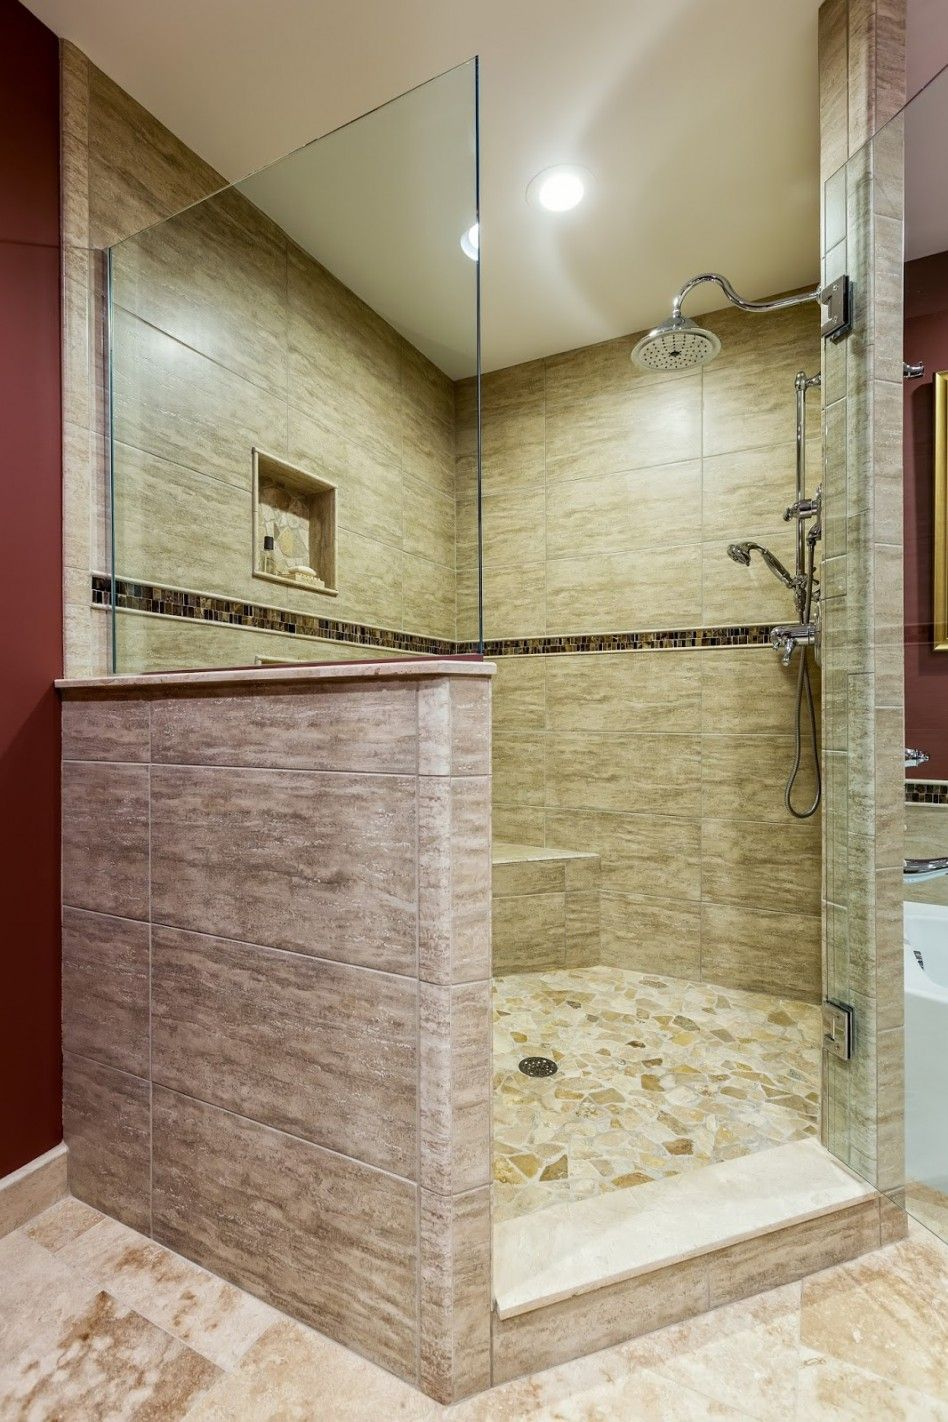 Bathroom design ideas with mosaic tiles - Glass Mosaic Tile Bathroom Ideas With Cream Stone Bathroom Flooring Design Including Cream Porcelain Tile Bathroom